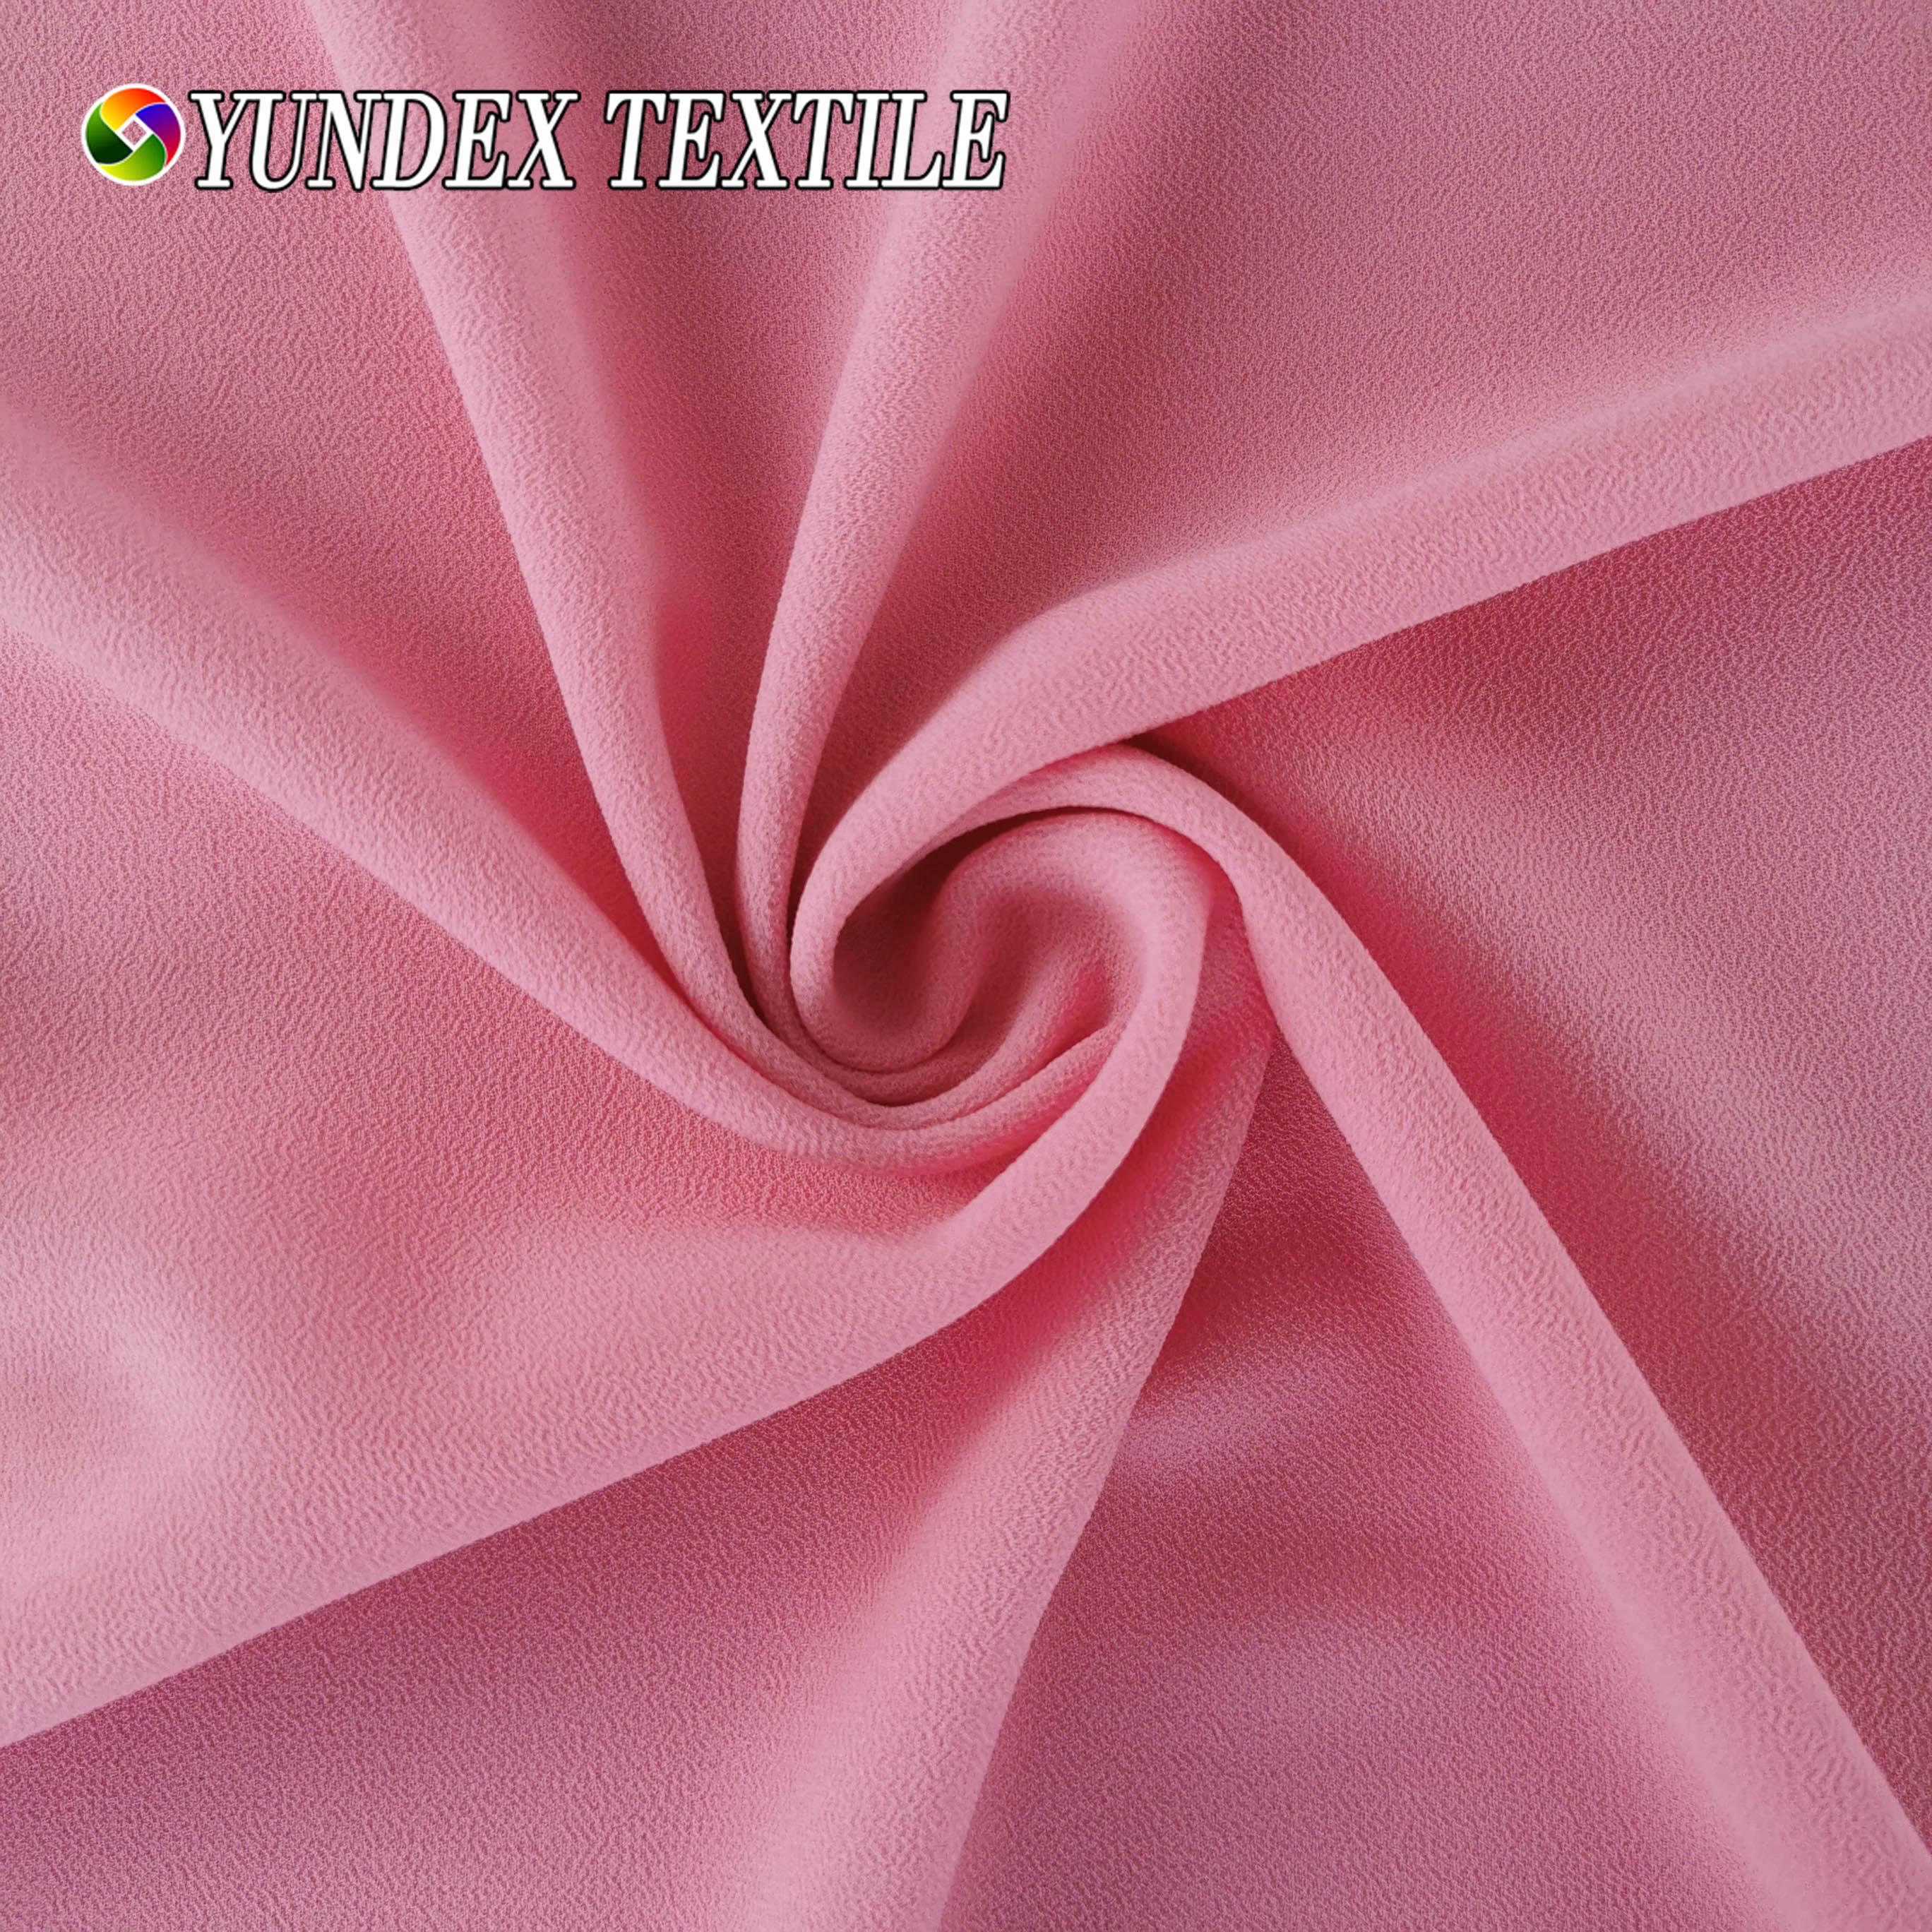 High Quality Georgette Stretch Pearl Chiffon 75D Plain Dyed Premium Ceruty Babydoll Chiffon Fabrics for Maxi Dress and Scarf